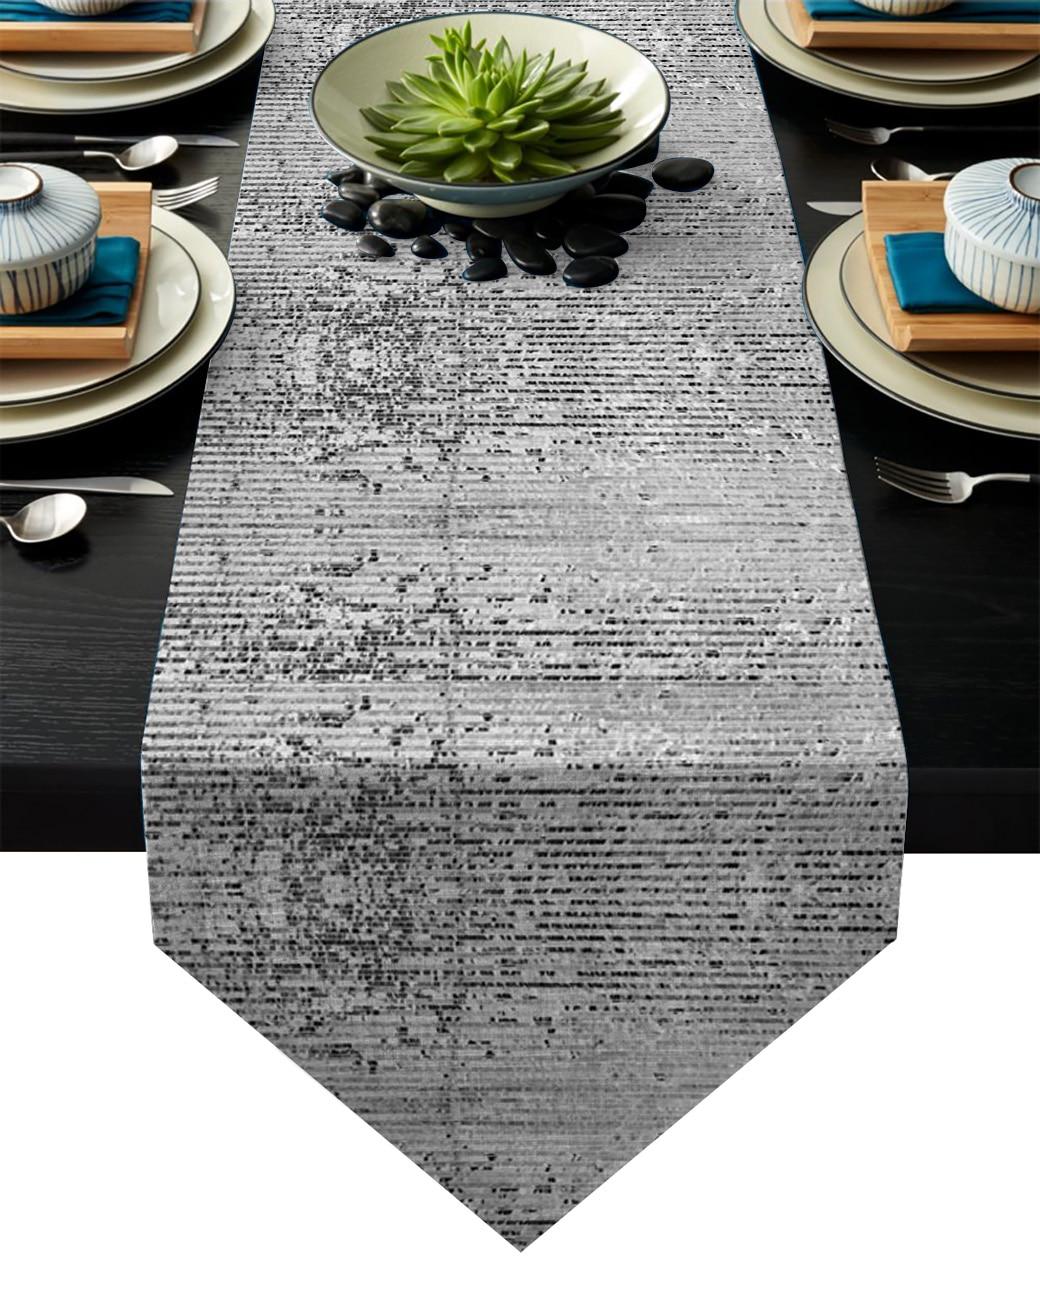 Placa plateada de lentejuelas Rectangular brillante camino de mesa bandera decoración de fiesta casera mantel caminos de mesa